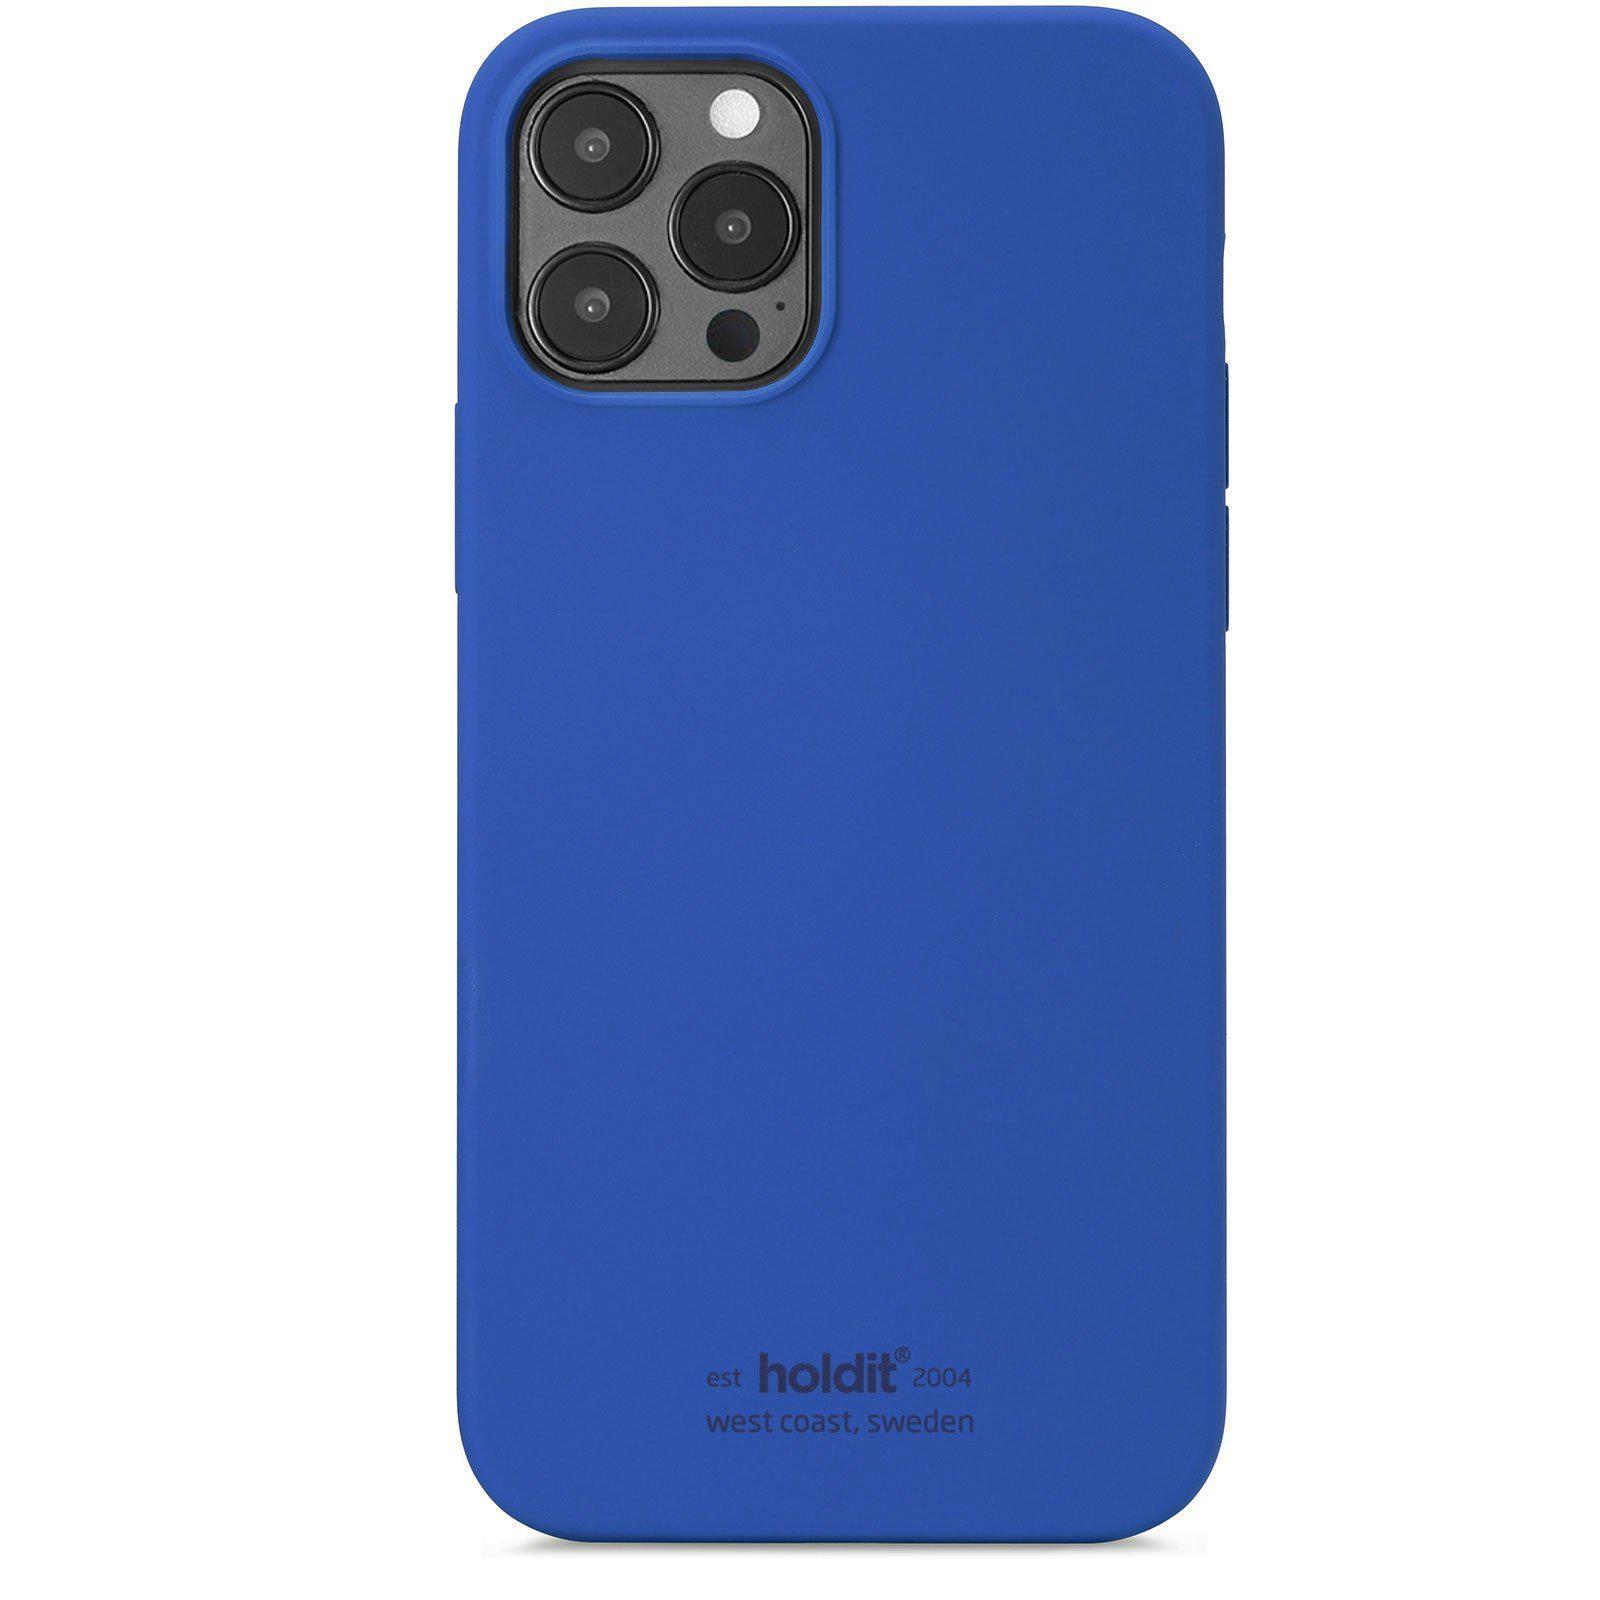 Silikonskal iPhone 12 Pro Max Royal Blue